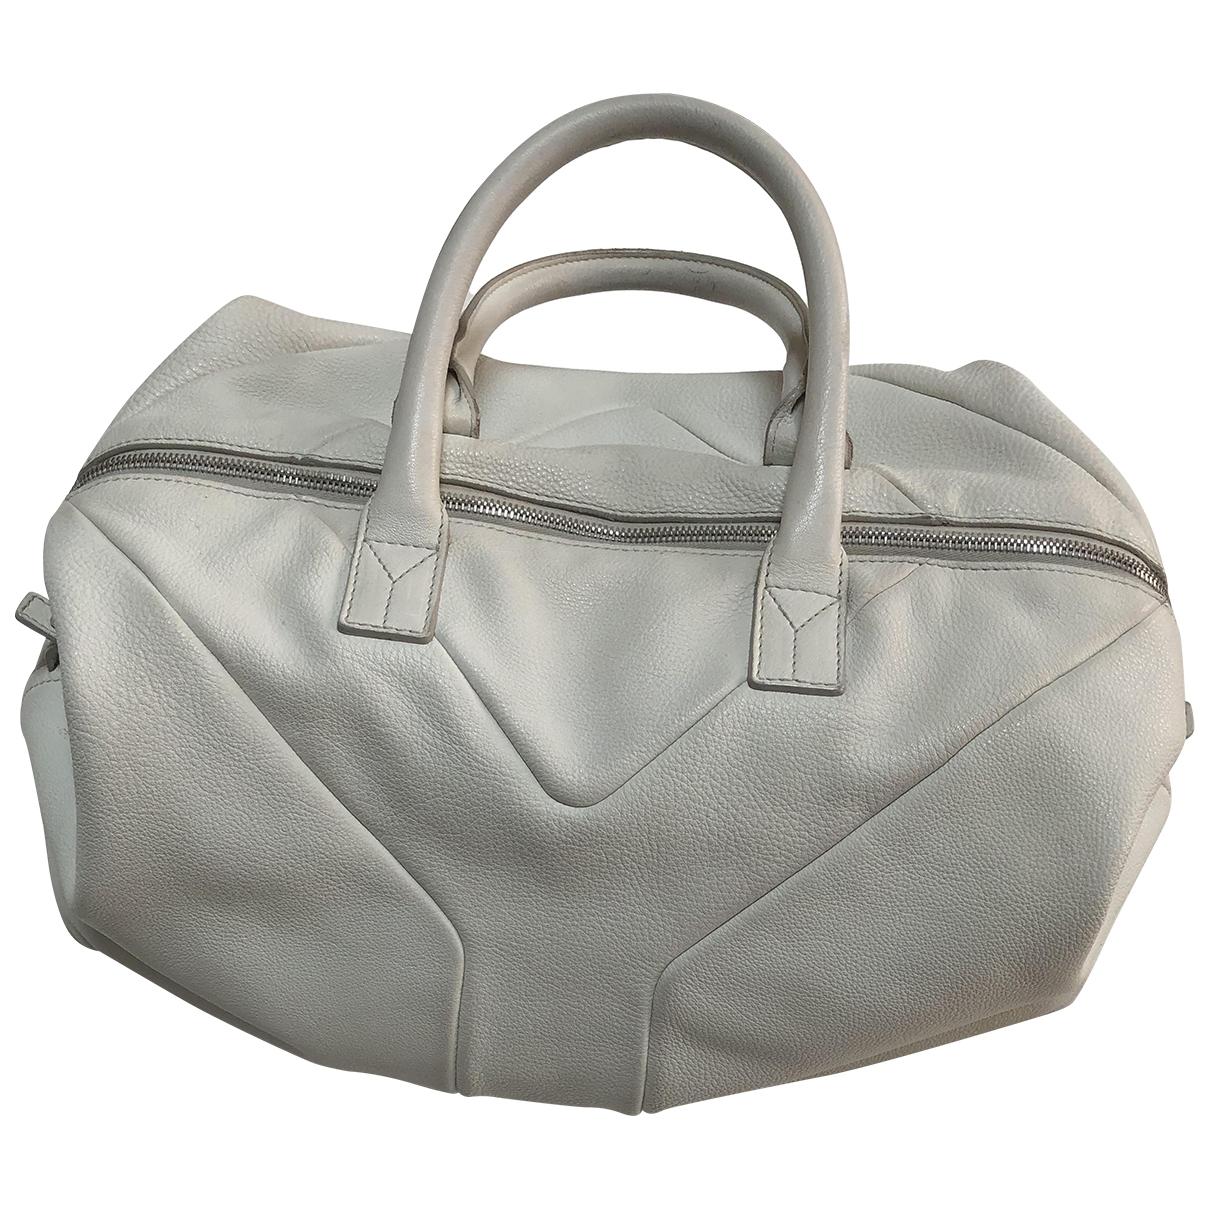 Yves Saint Laurent - Sac a main Easy pour femme en cuir - blanc